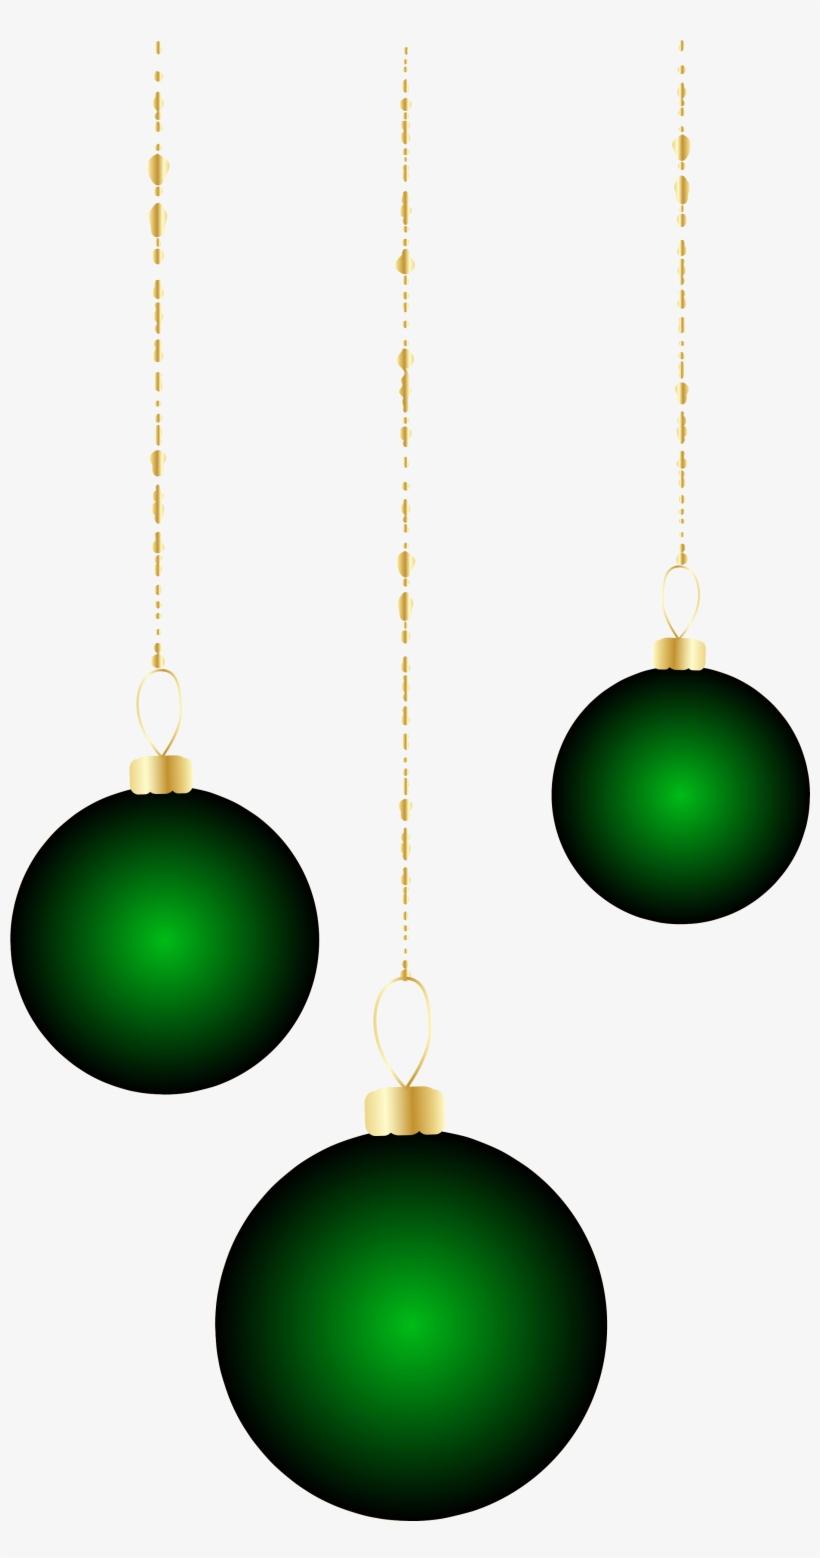 Transparent Christmas Green Ornaments Png Clipart - Christmas Ornament, transparent png #499465